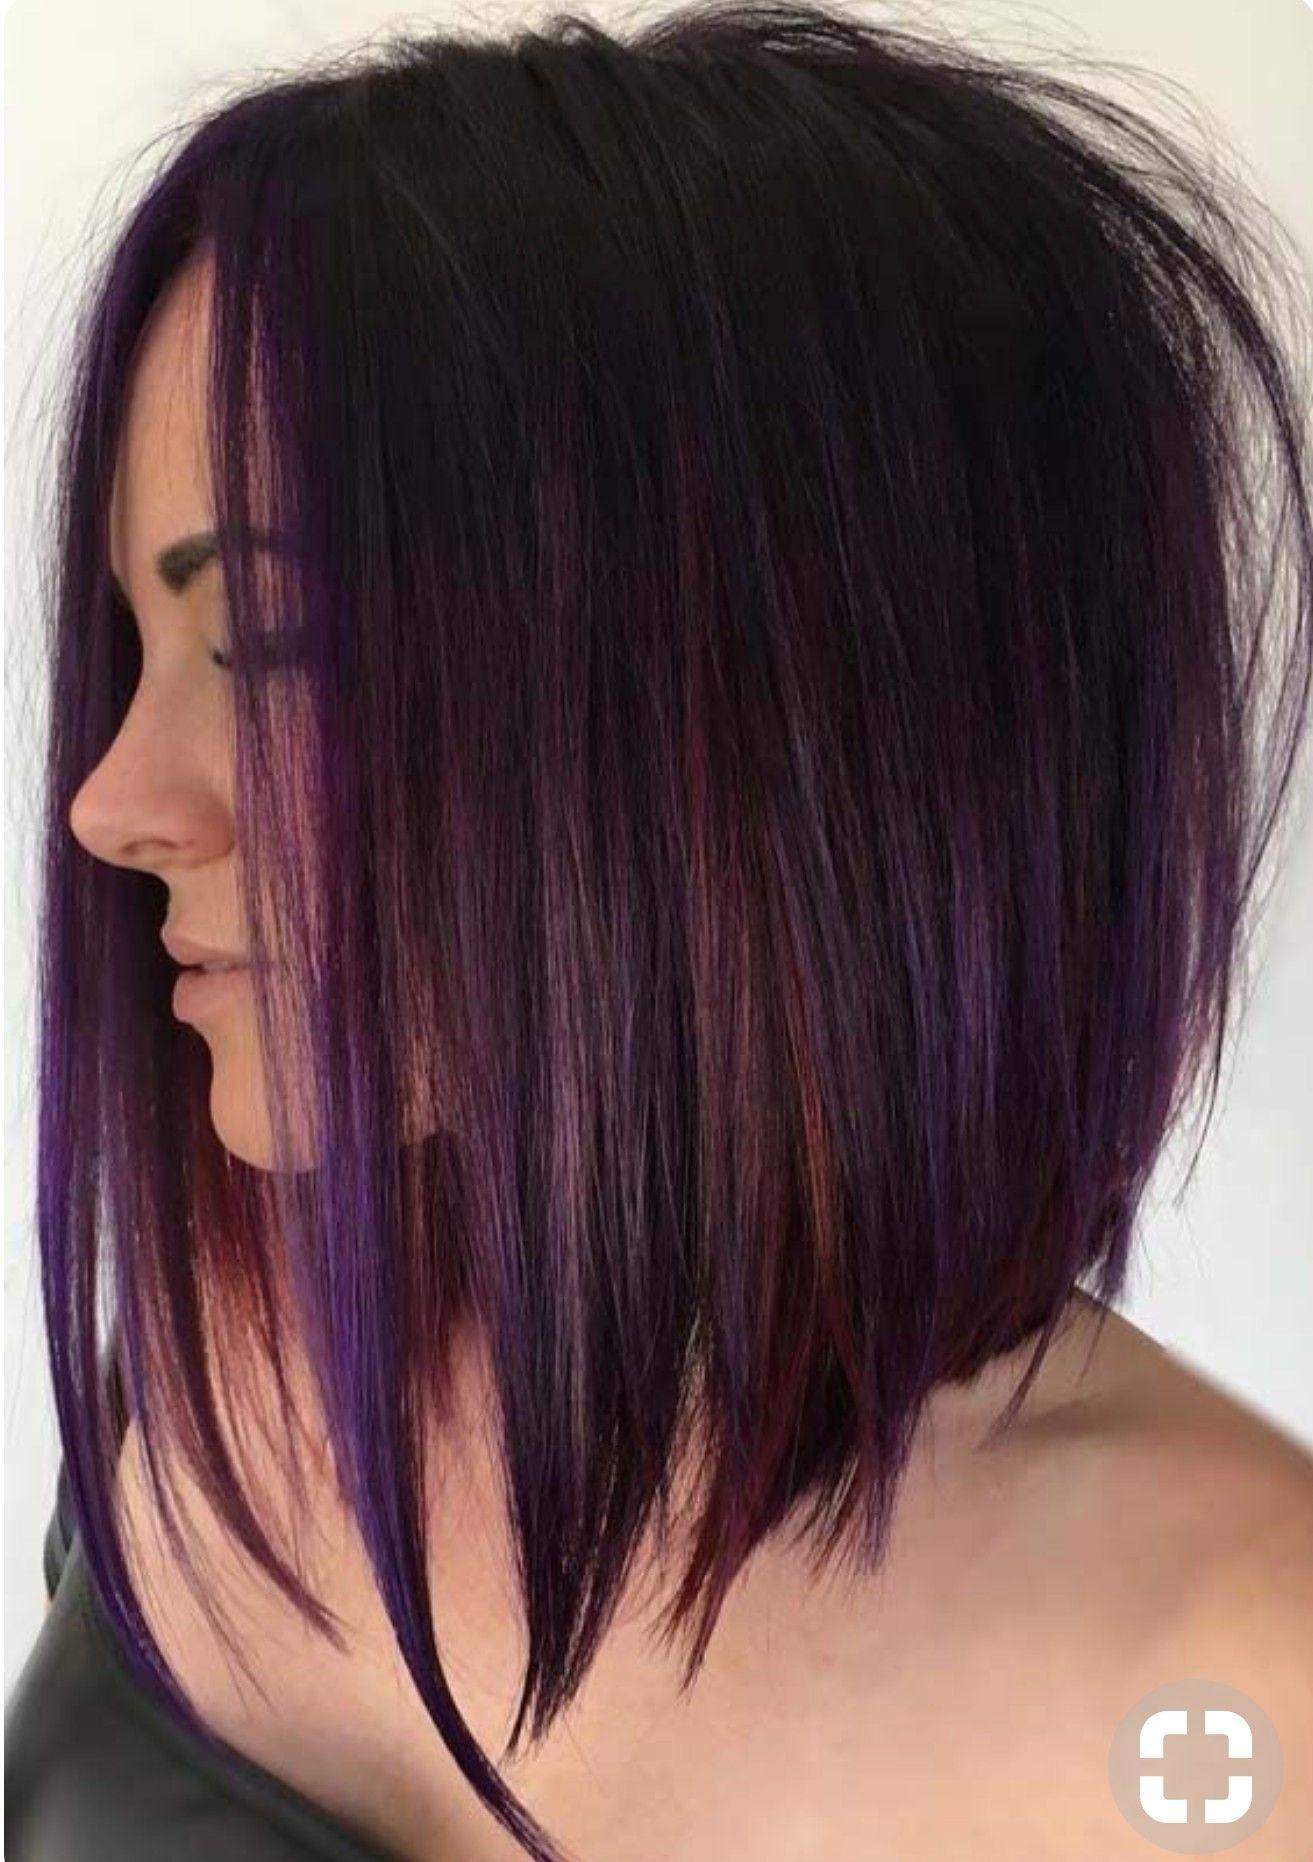 500 Hair Ideas In 2020 Hair Hair Styles Cool Hairstyles